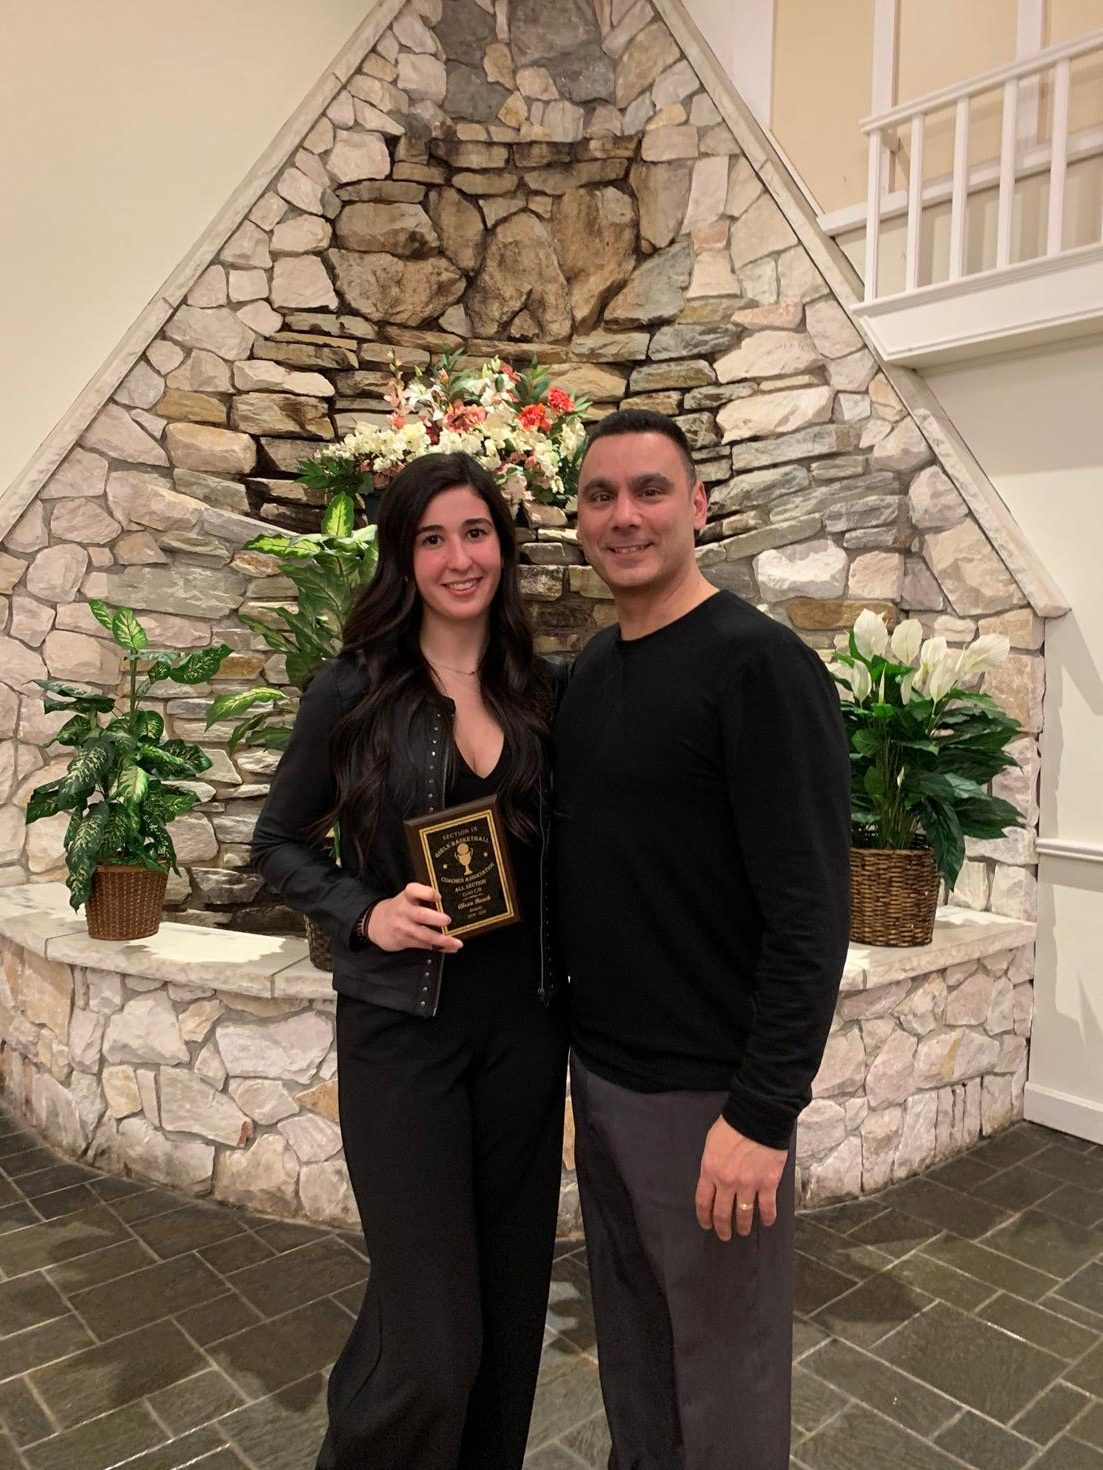 Alexa Roach Award